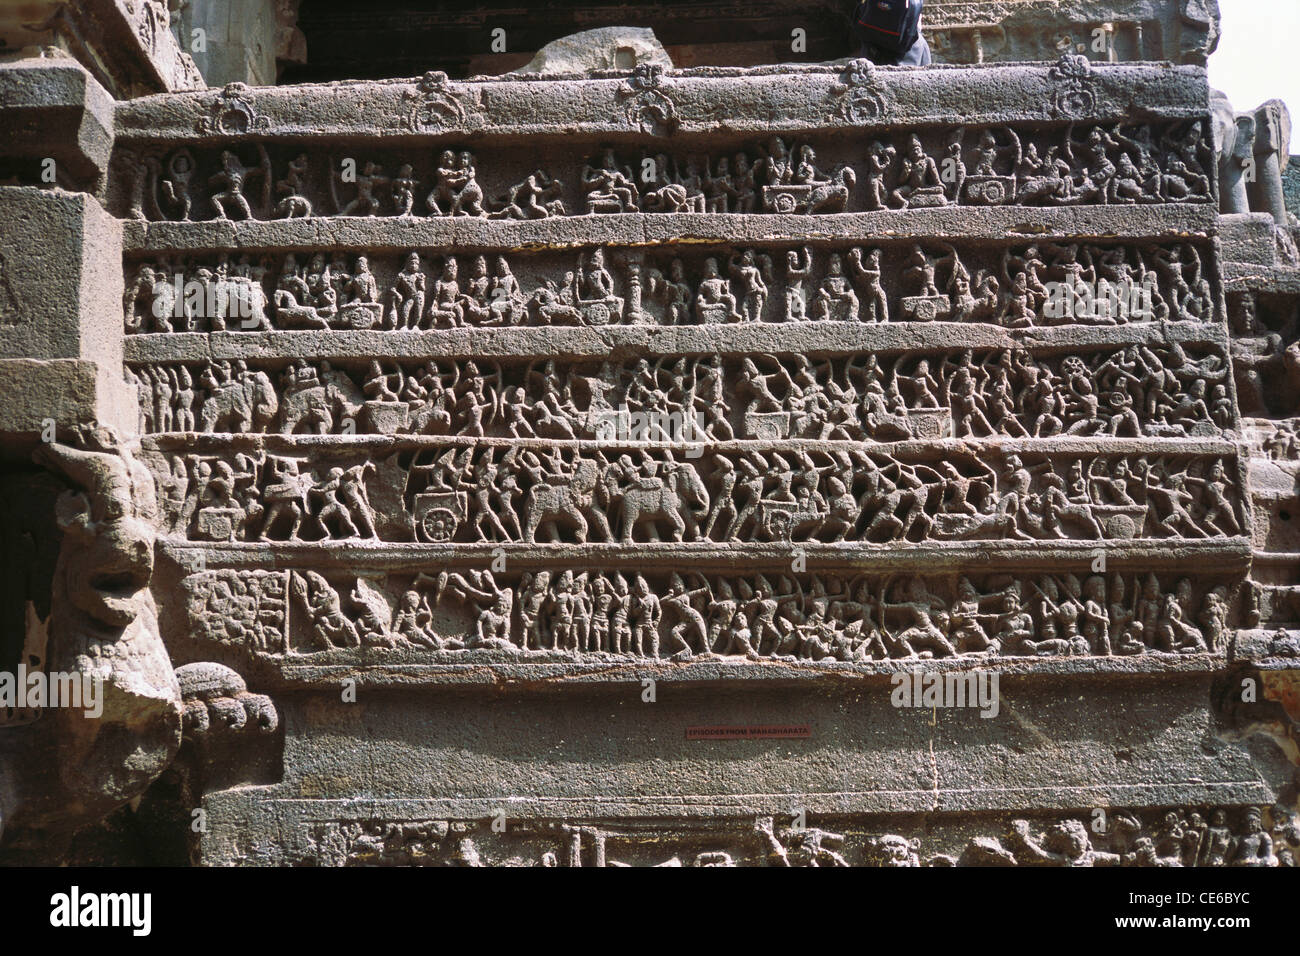 Mahabharata on walls in Ellora cave number 16 ; aurangabad Maharashtra ; India - Stock Image